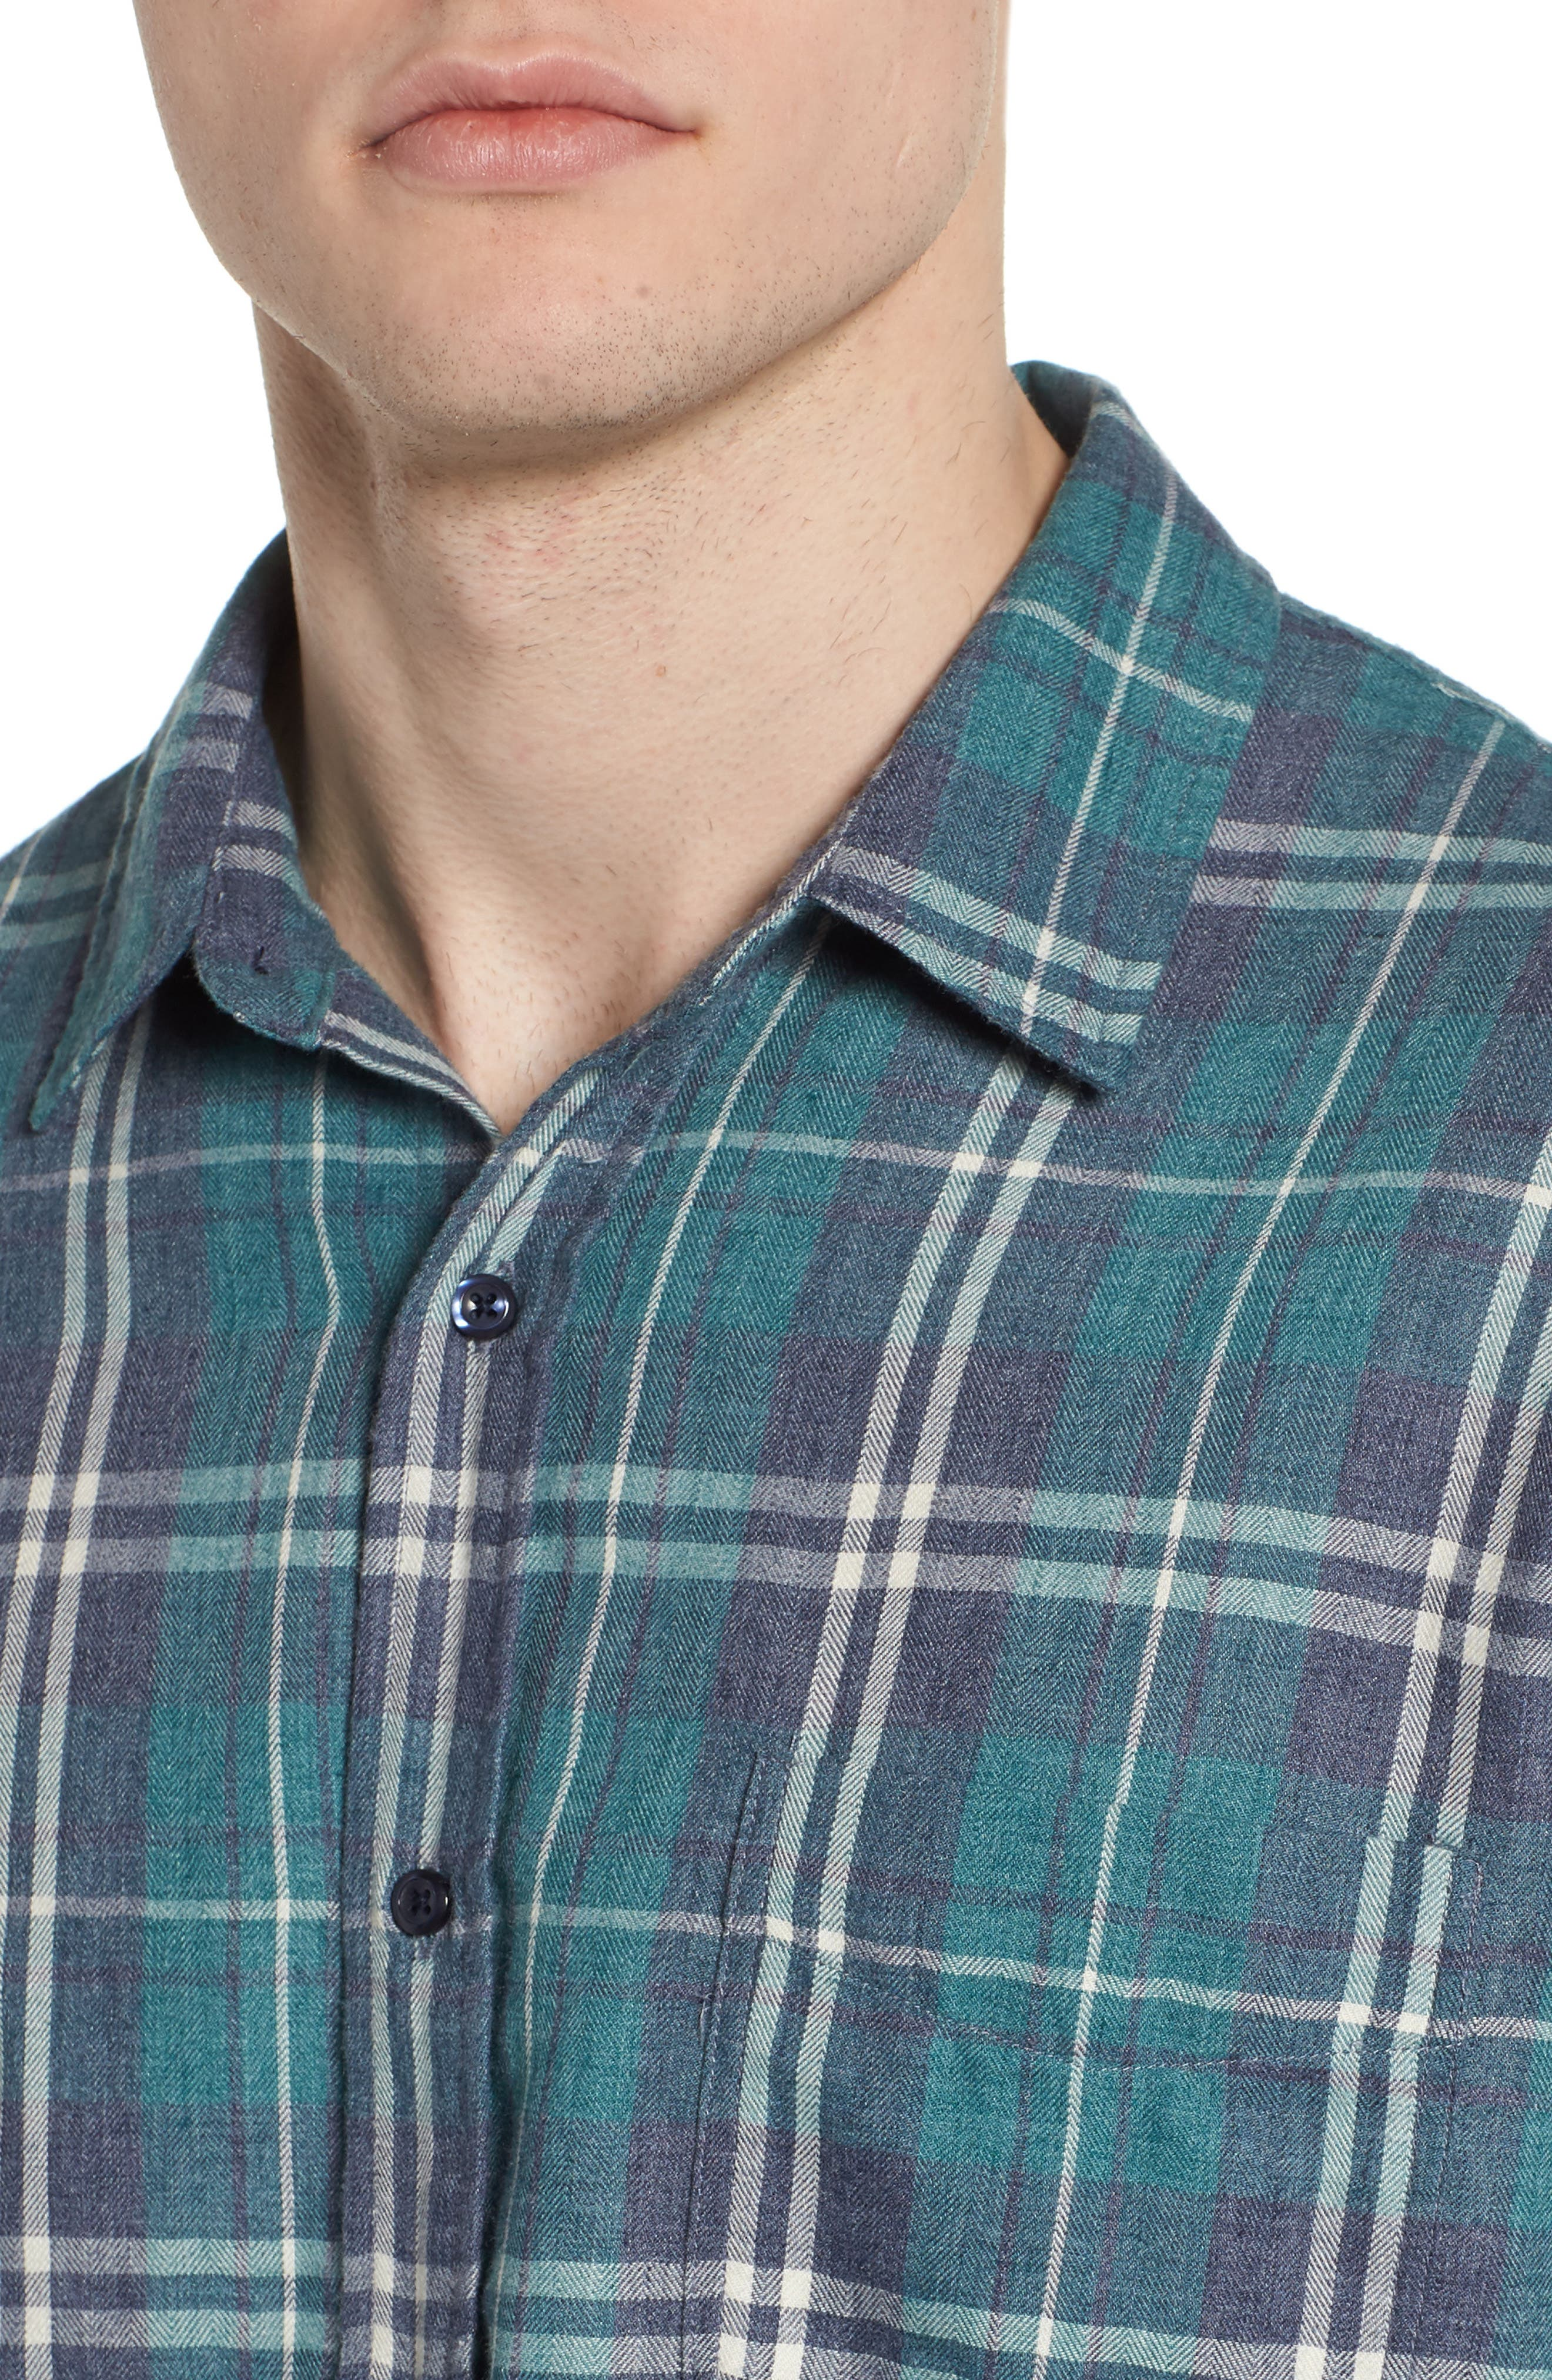 Lennox Slim Fit Plaid Woven Shirt,                             Alternate thumbnail 4, color,                             Veridian Navy White